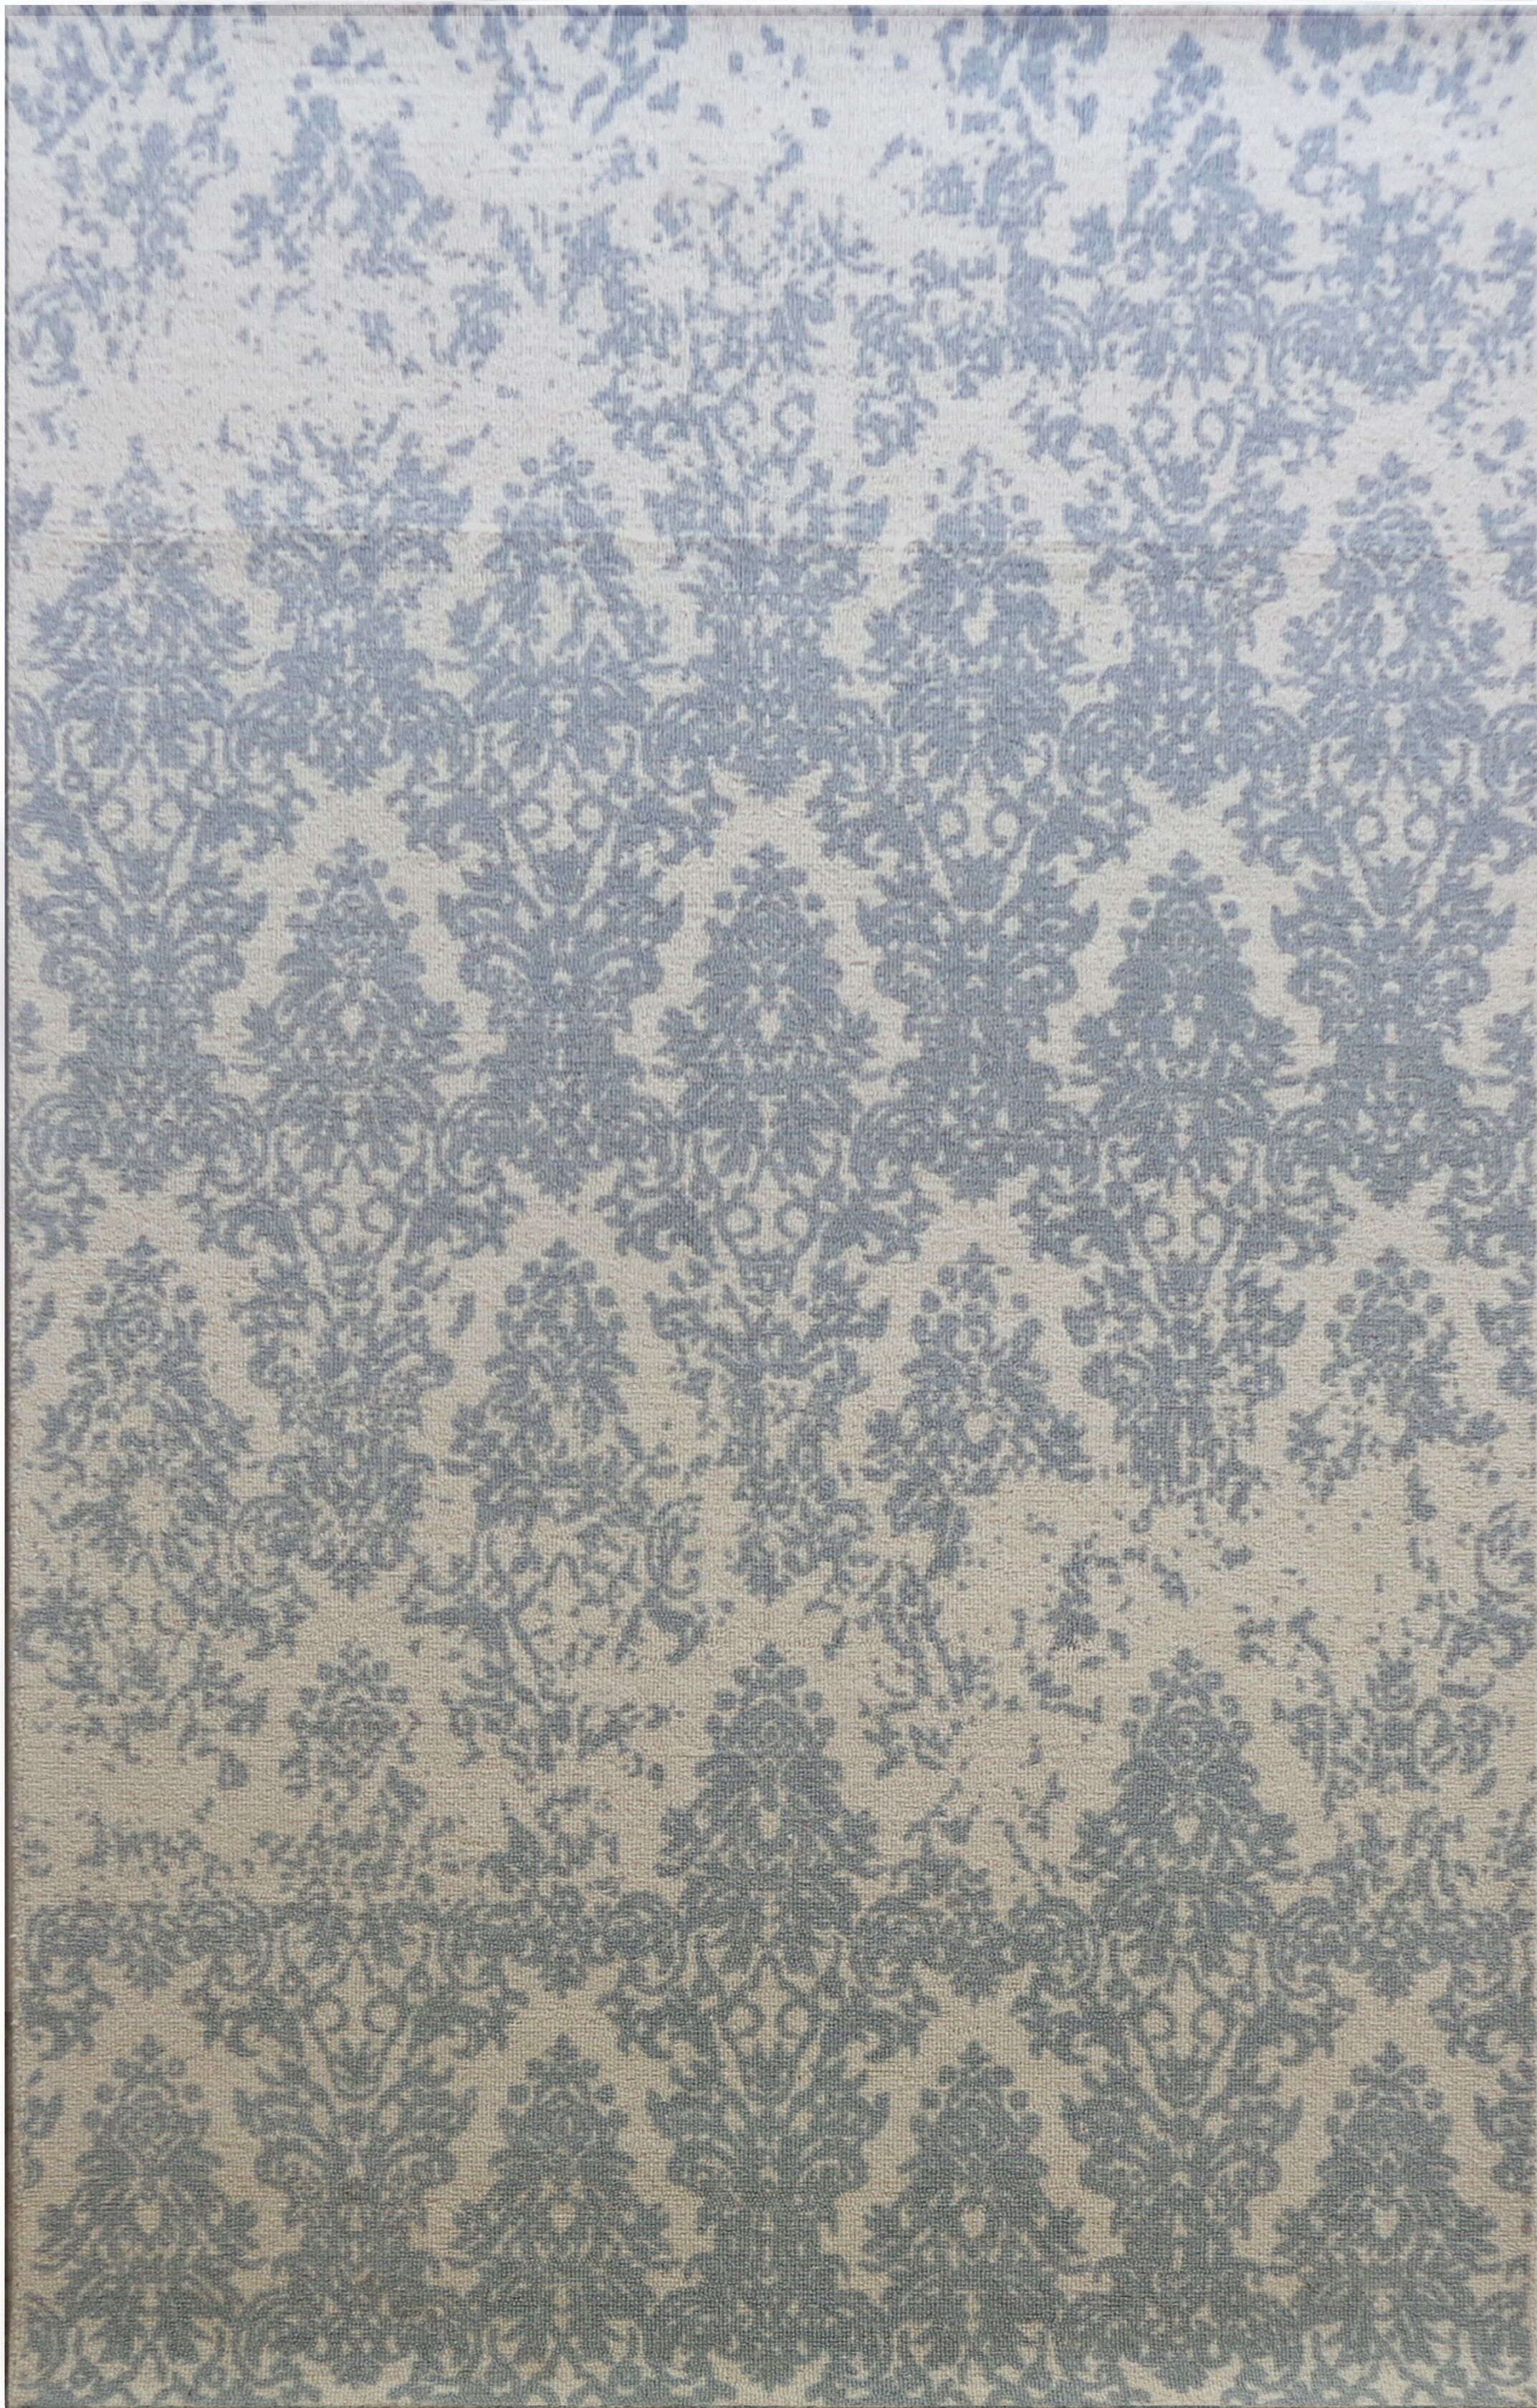 Anamaria Hand-Woven Ivory/Gray Area Rug Rug Size: Rectangle 5' x 8'